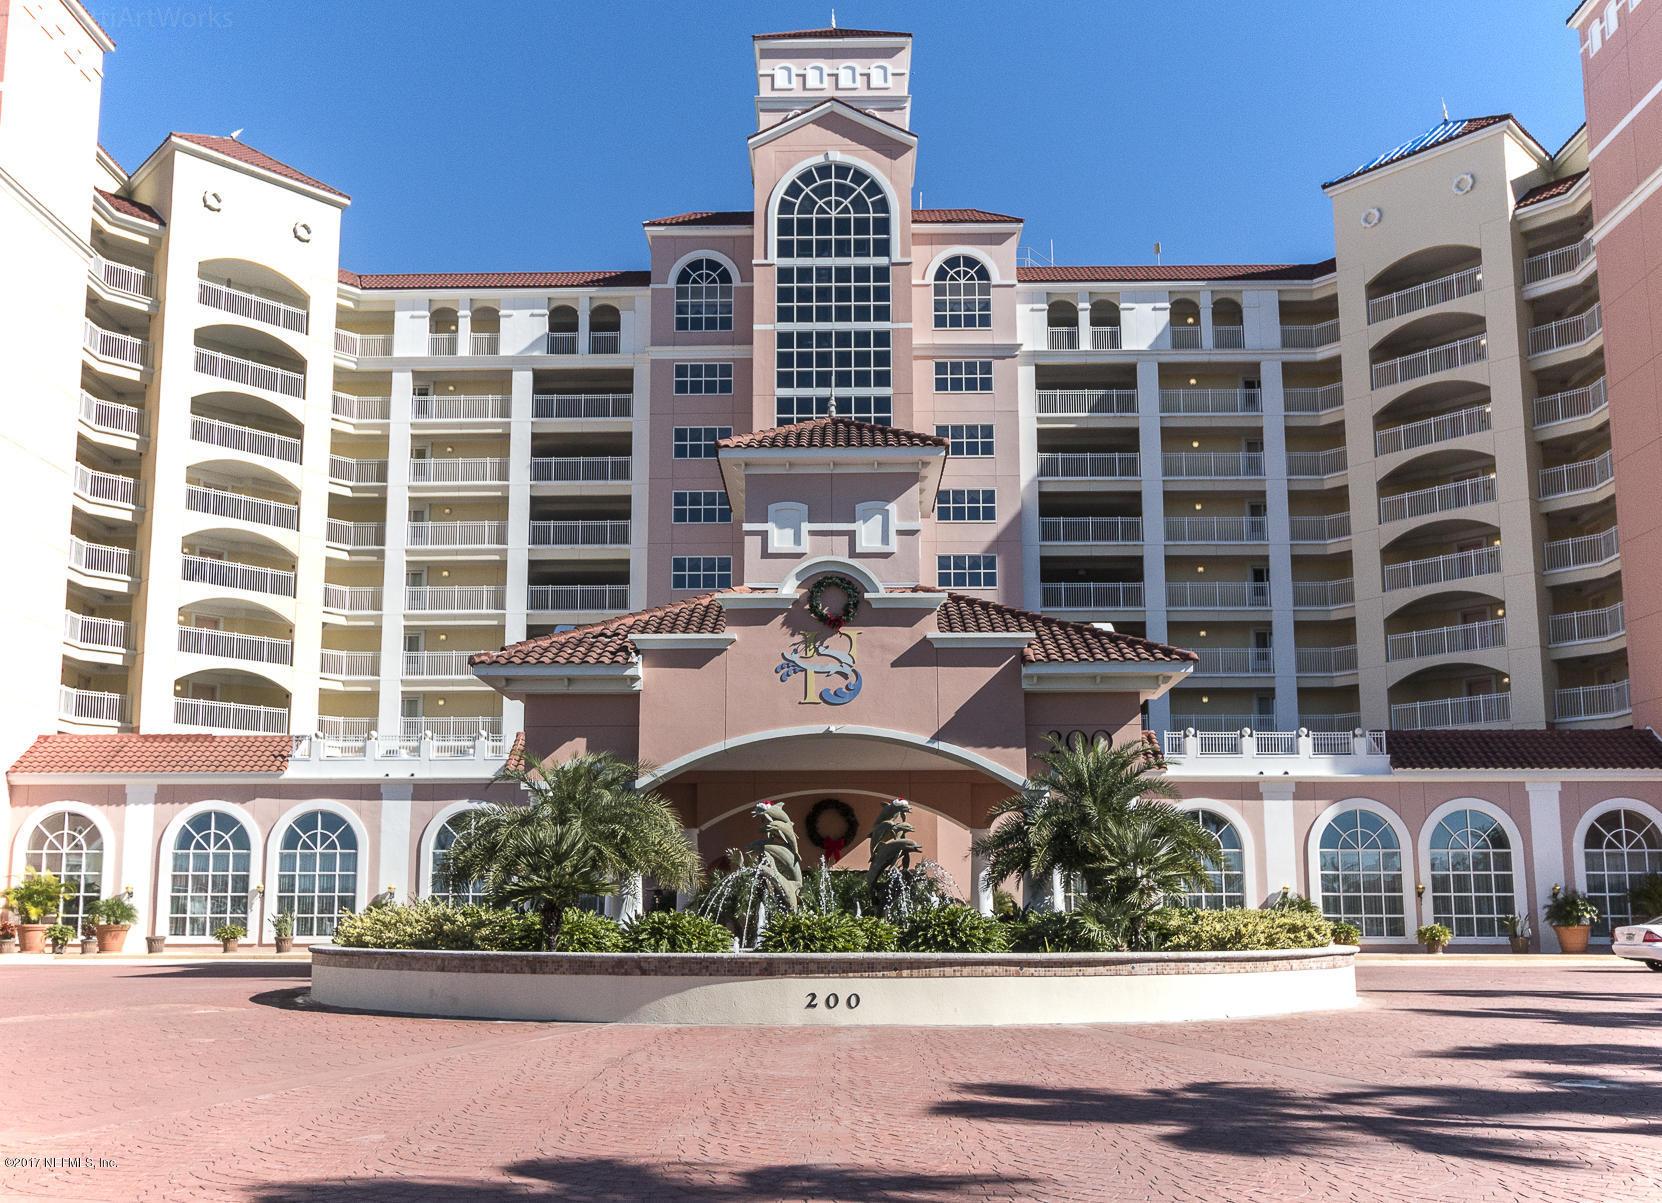 200 OCEAN CREST, PALM COAST, FLORIDA 32137, 4 Bedrooms Bedrooms, ,3 BathroomsBathrooms,Residential - condos/townhomes,For sale,OCEAN CREST,912695